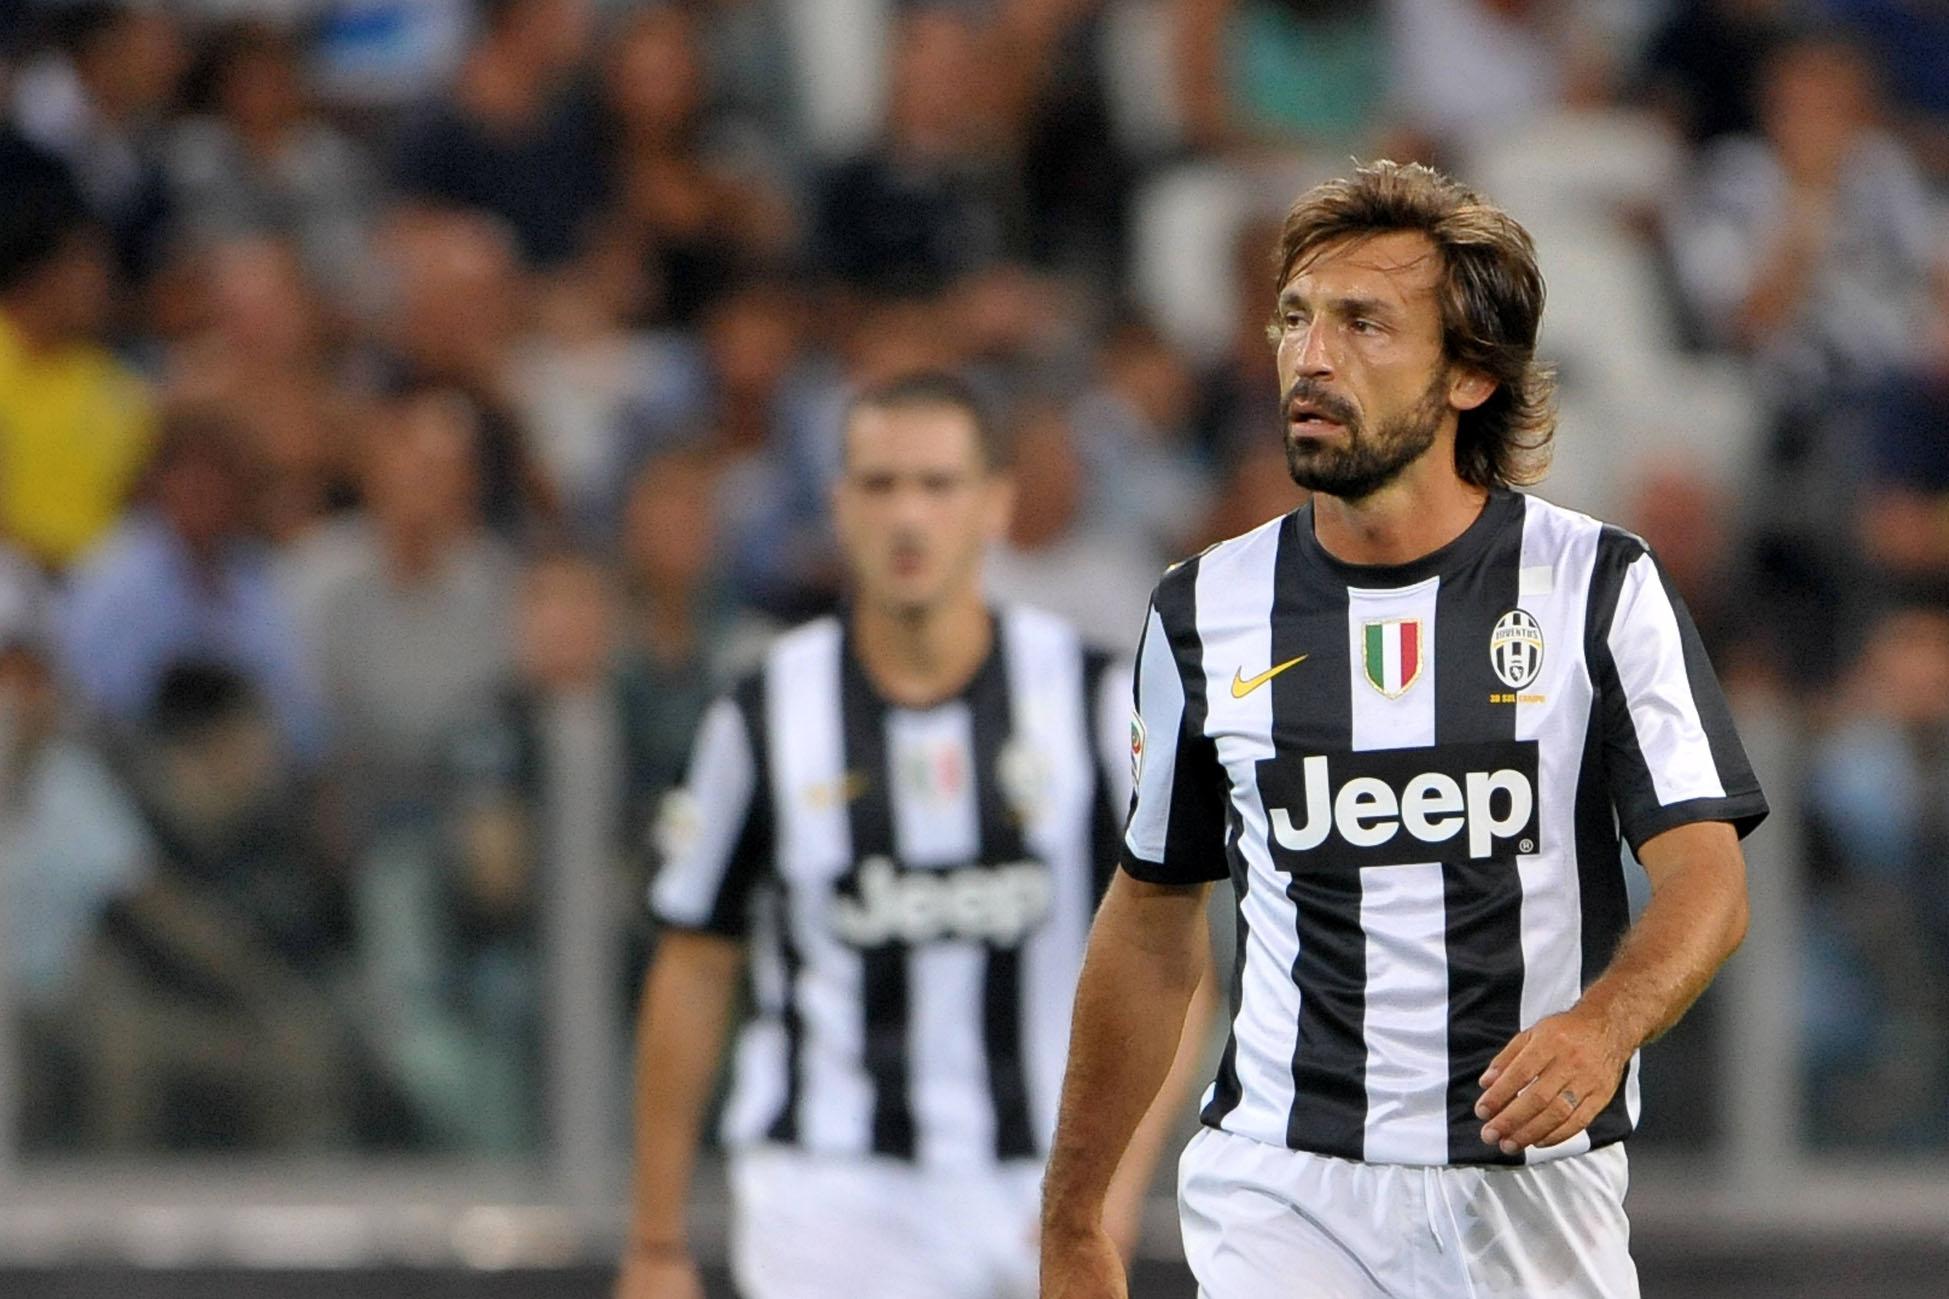 Juventus vs. Parma